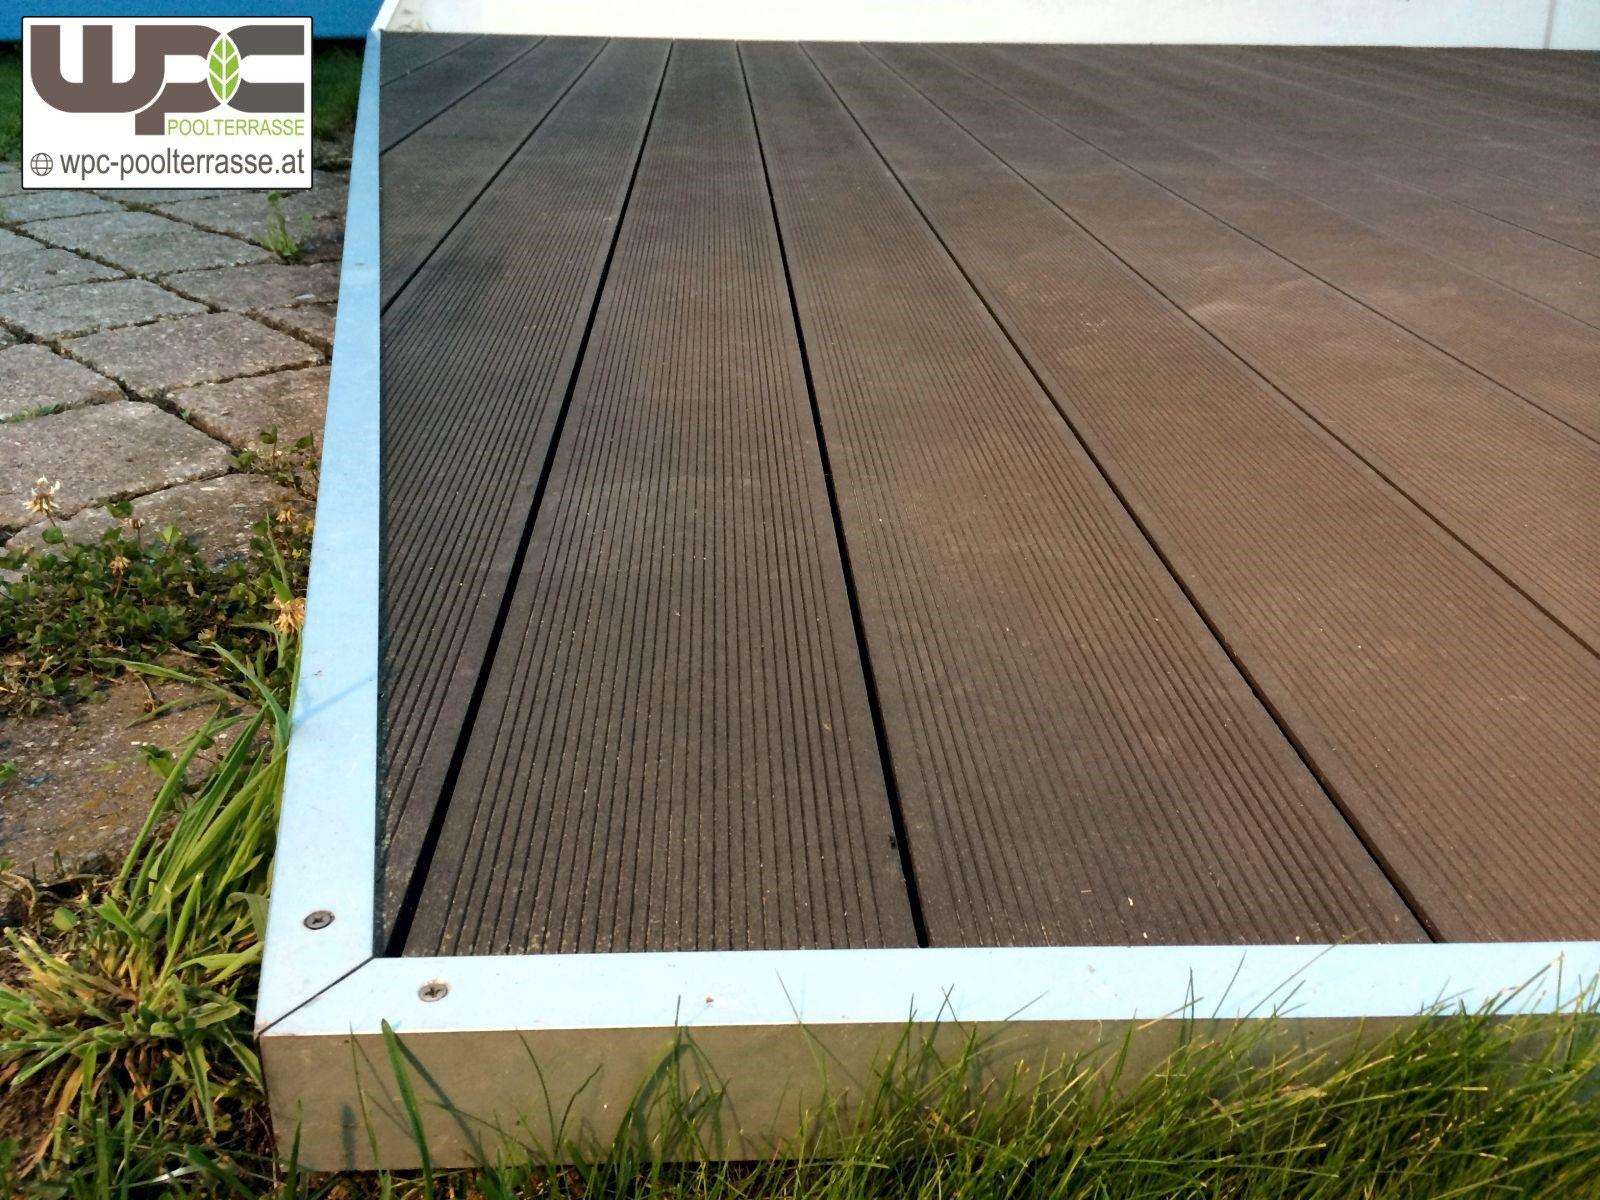 Wpc Fliesen Ikea Erfahrungen Abdeckung Induktionskochfeld Holz